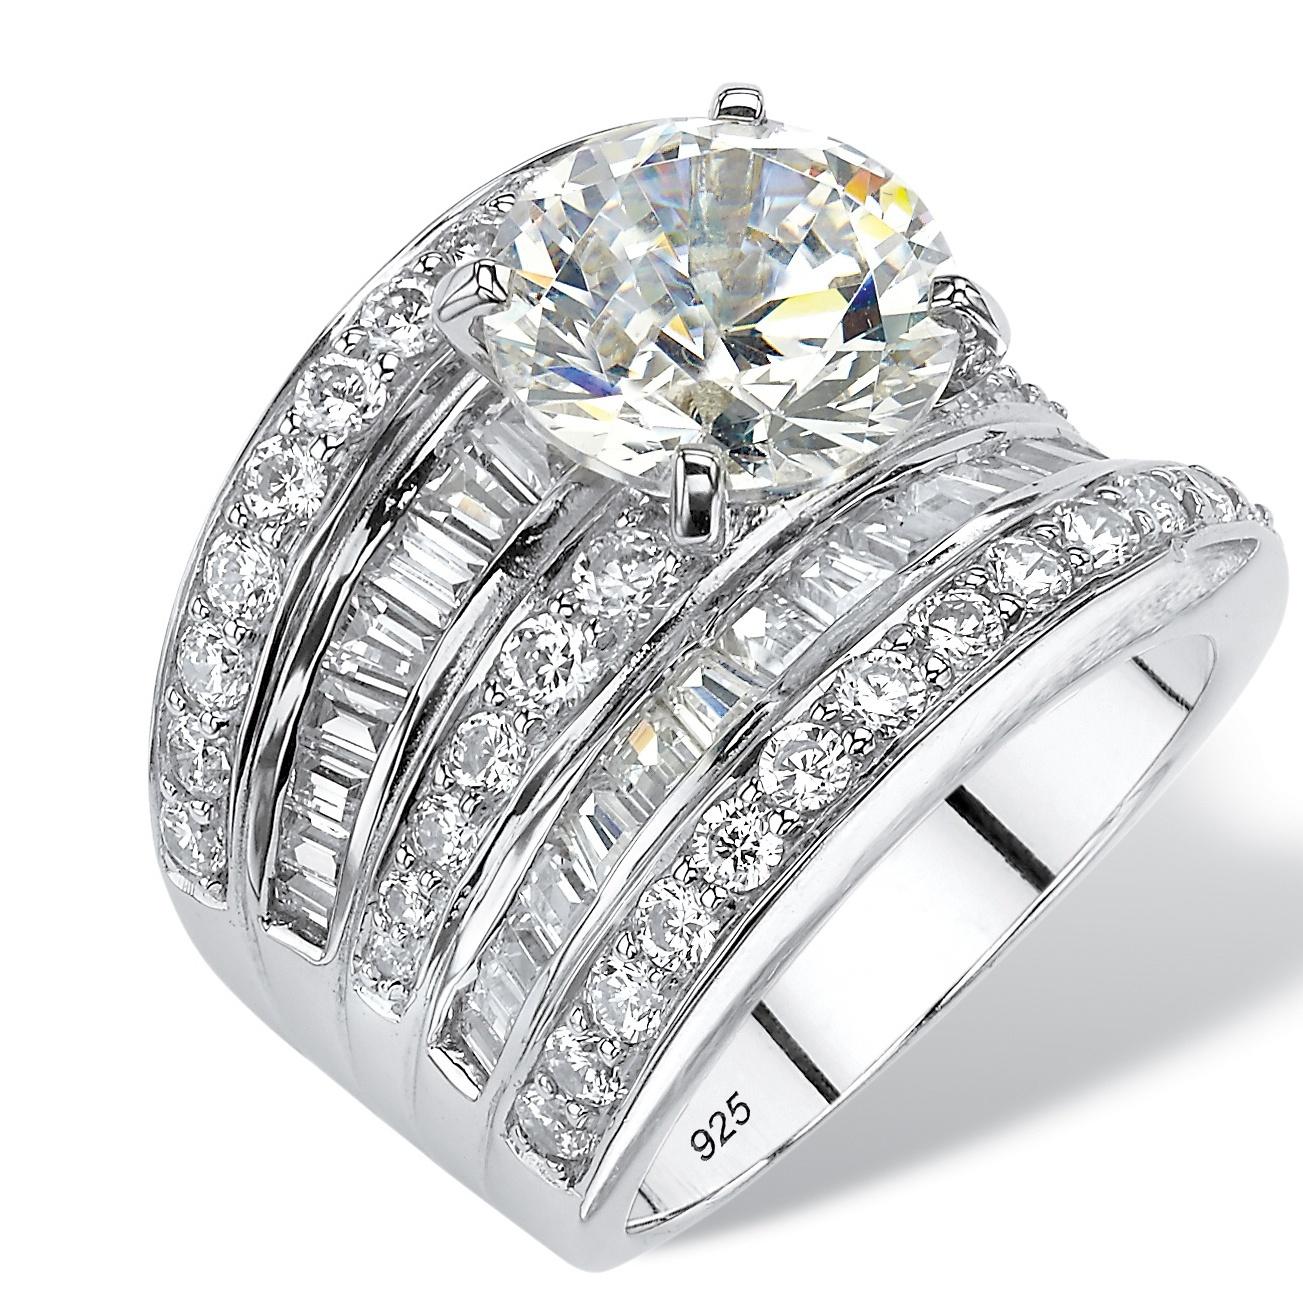 21 mm Wide mens ring designer Princes Baguette and Brilliant cut Solid 925 Silver